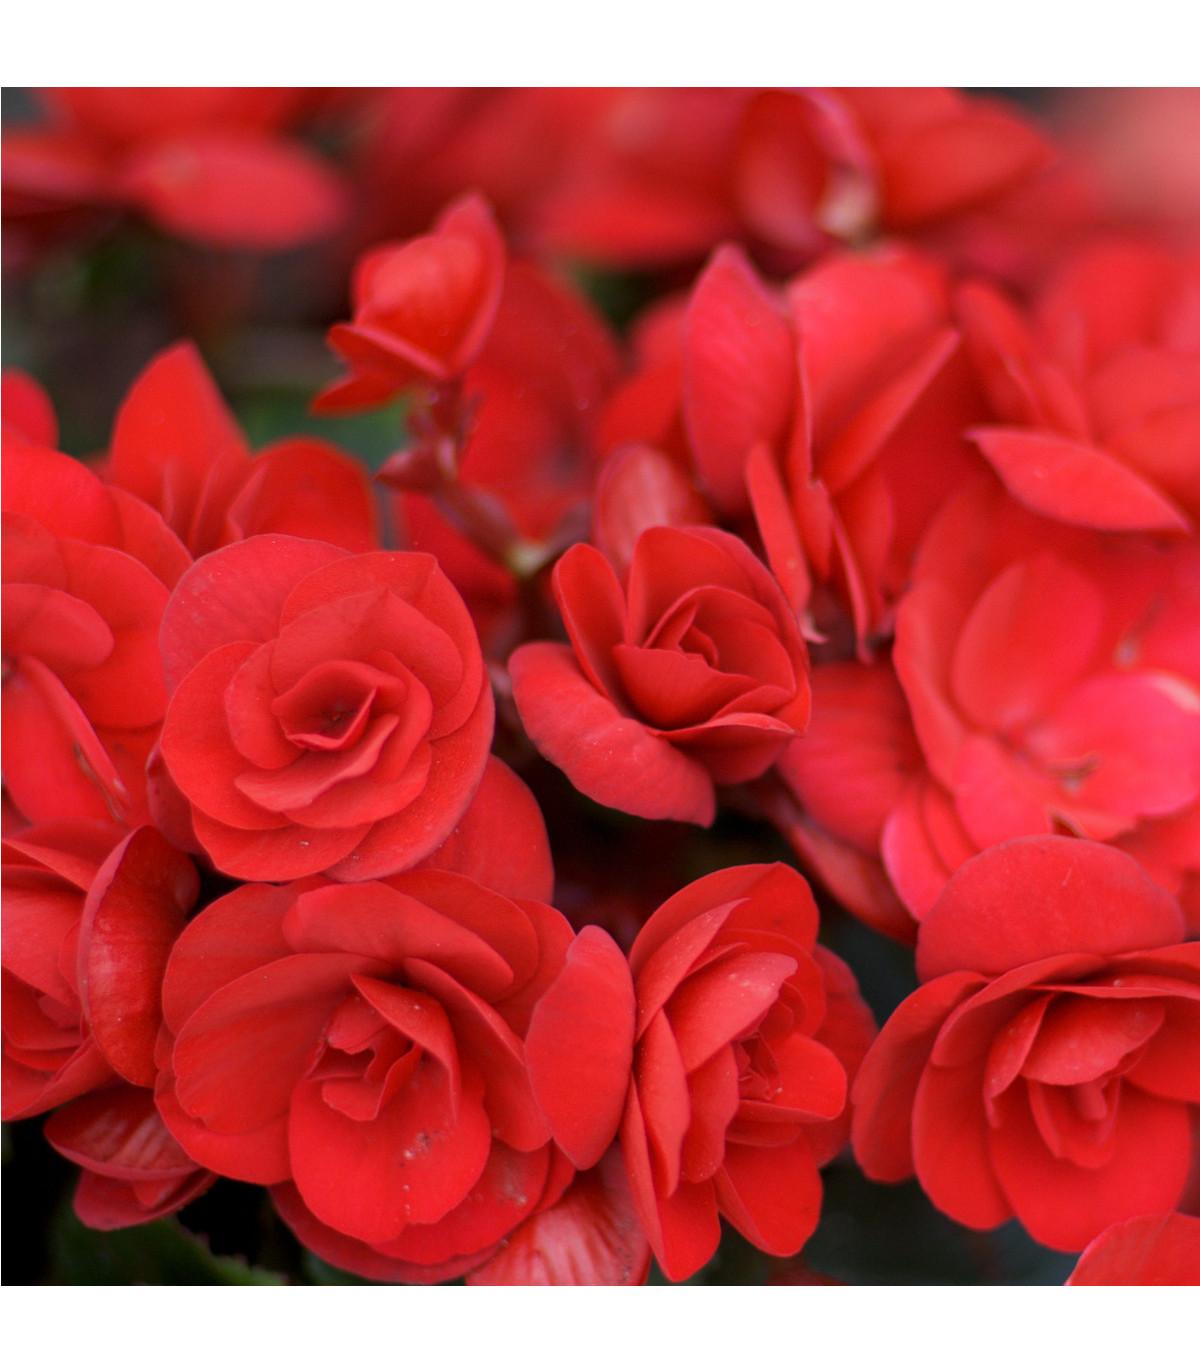 Drobnokvětá begonie červená - Begonia multiflora maxima - cibule begónií - 2 ks